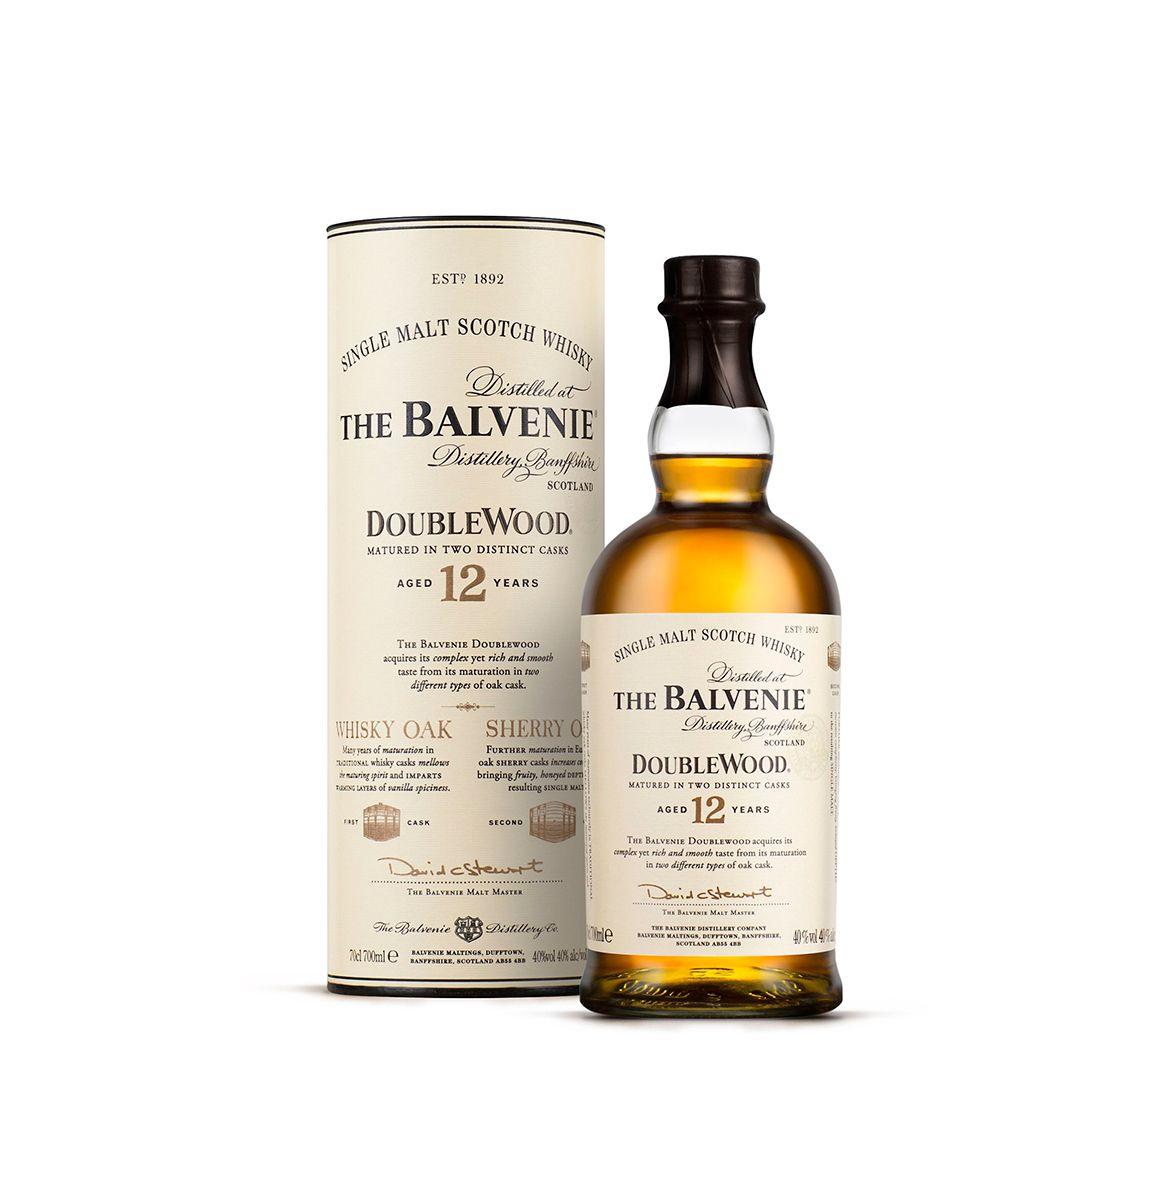 Balvenie Double Wood Whisky